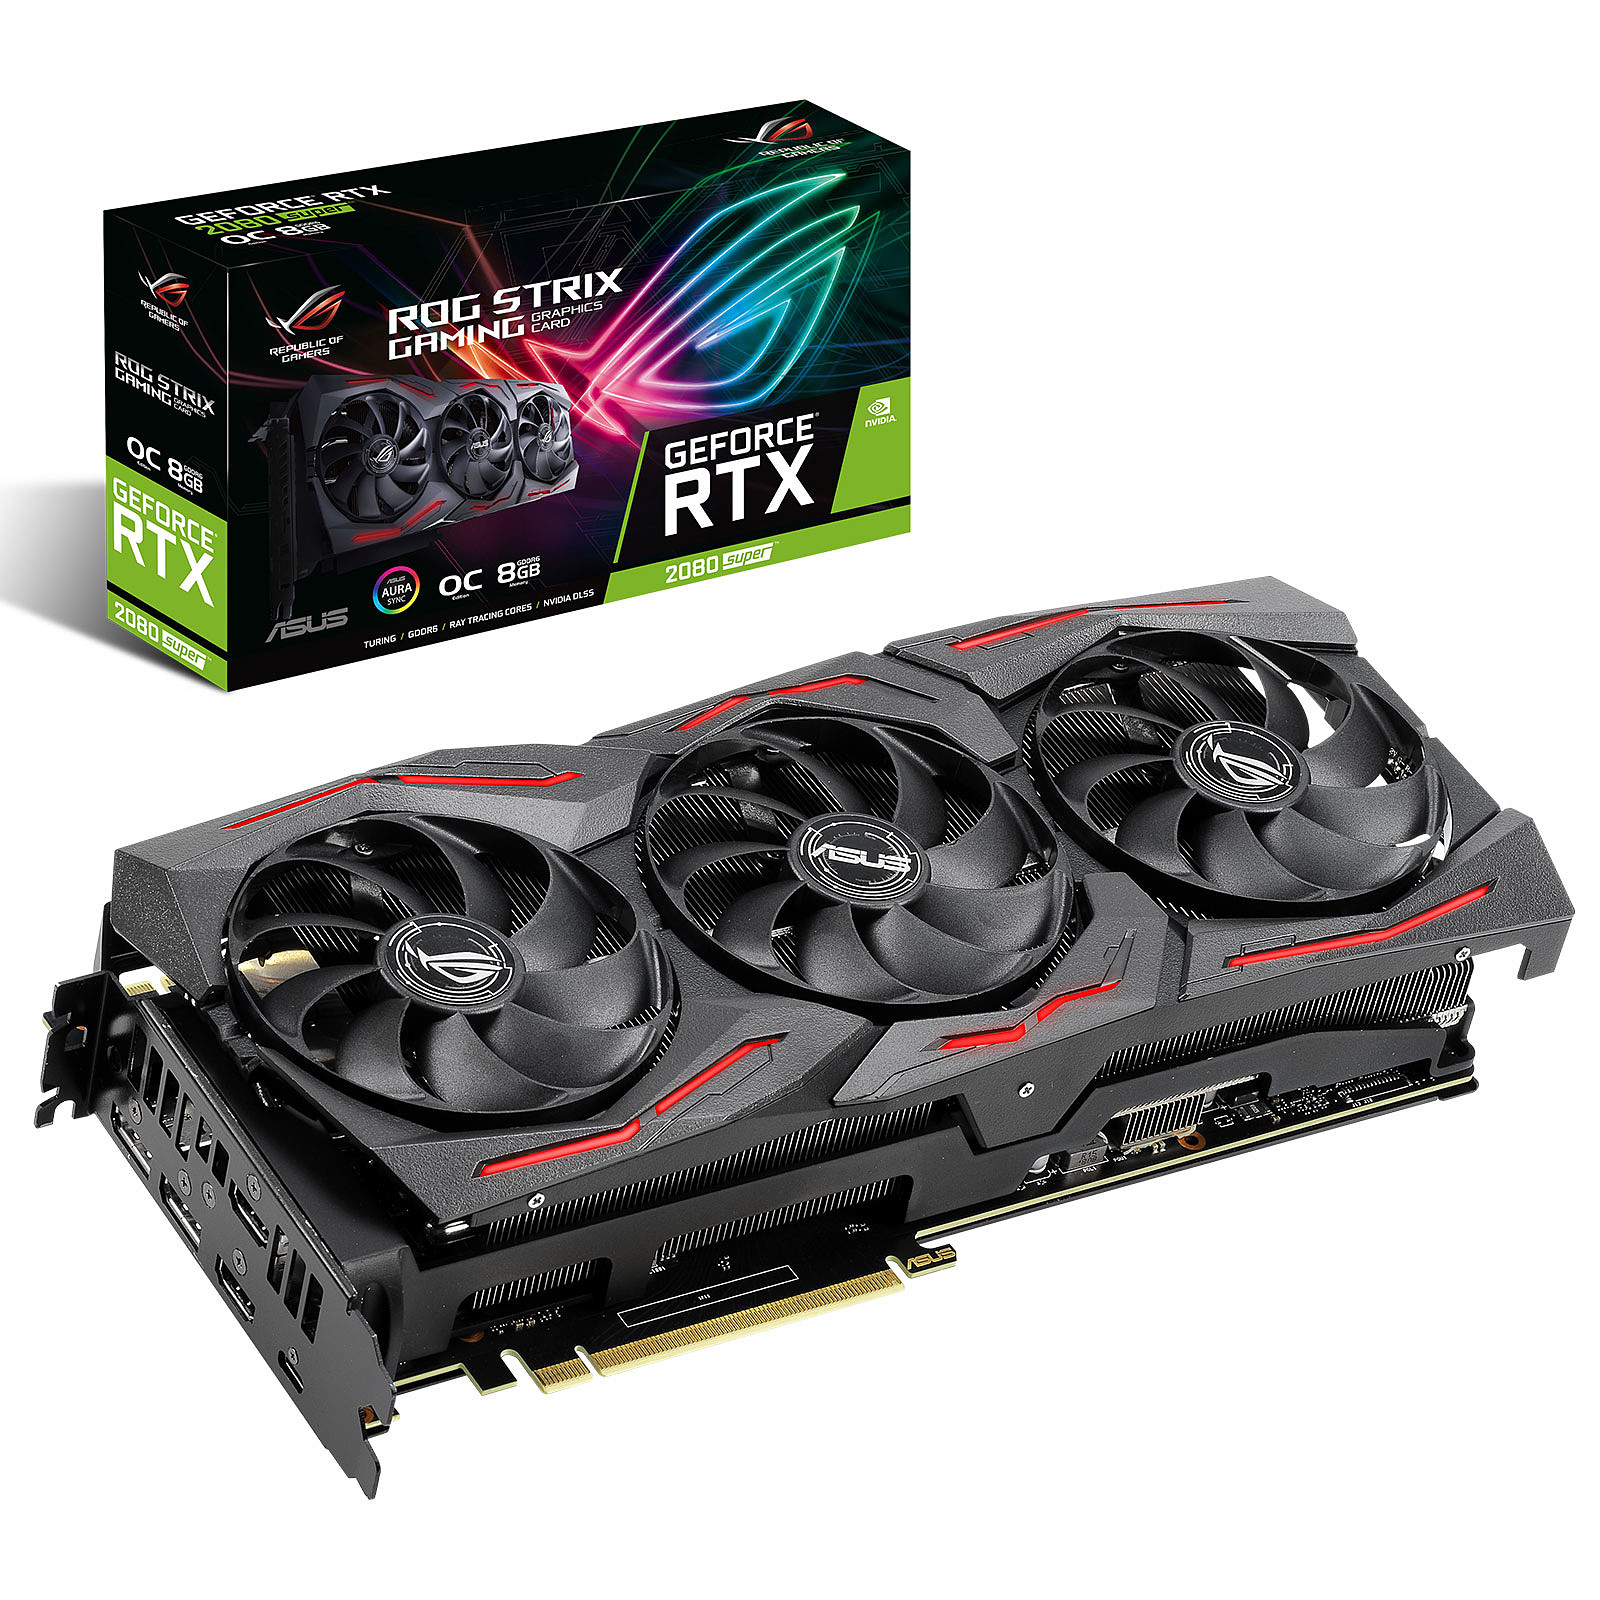 ASUS GeForce RTX 2080 SUPER ROG-STRIX-RTX2080S-O8G-GAMING